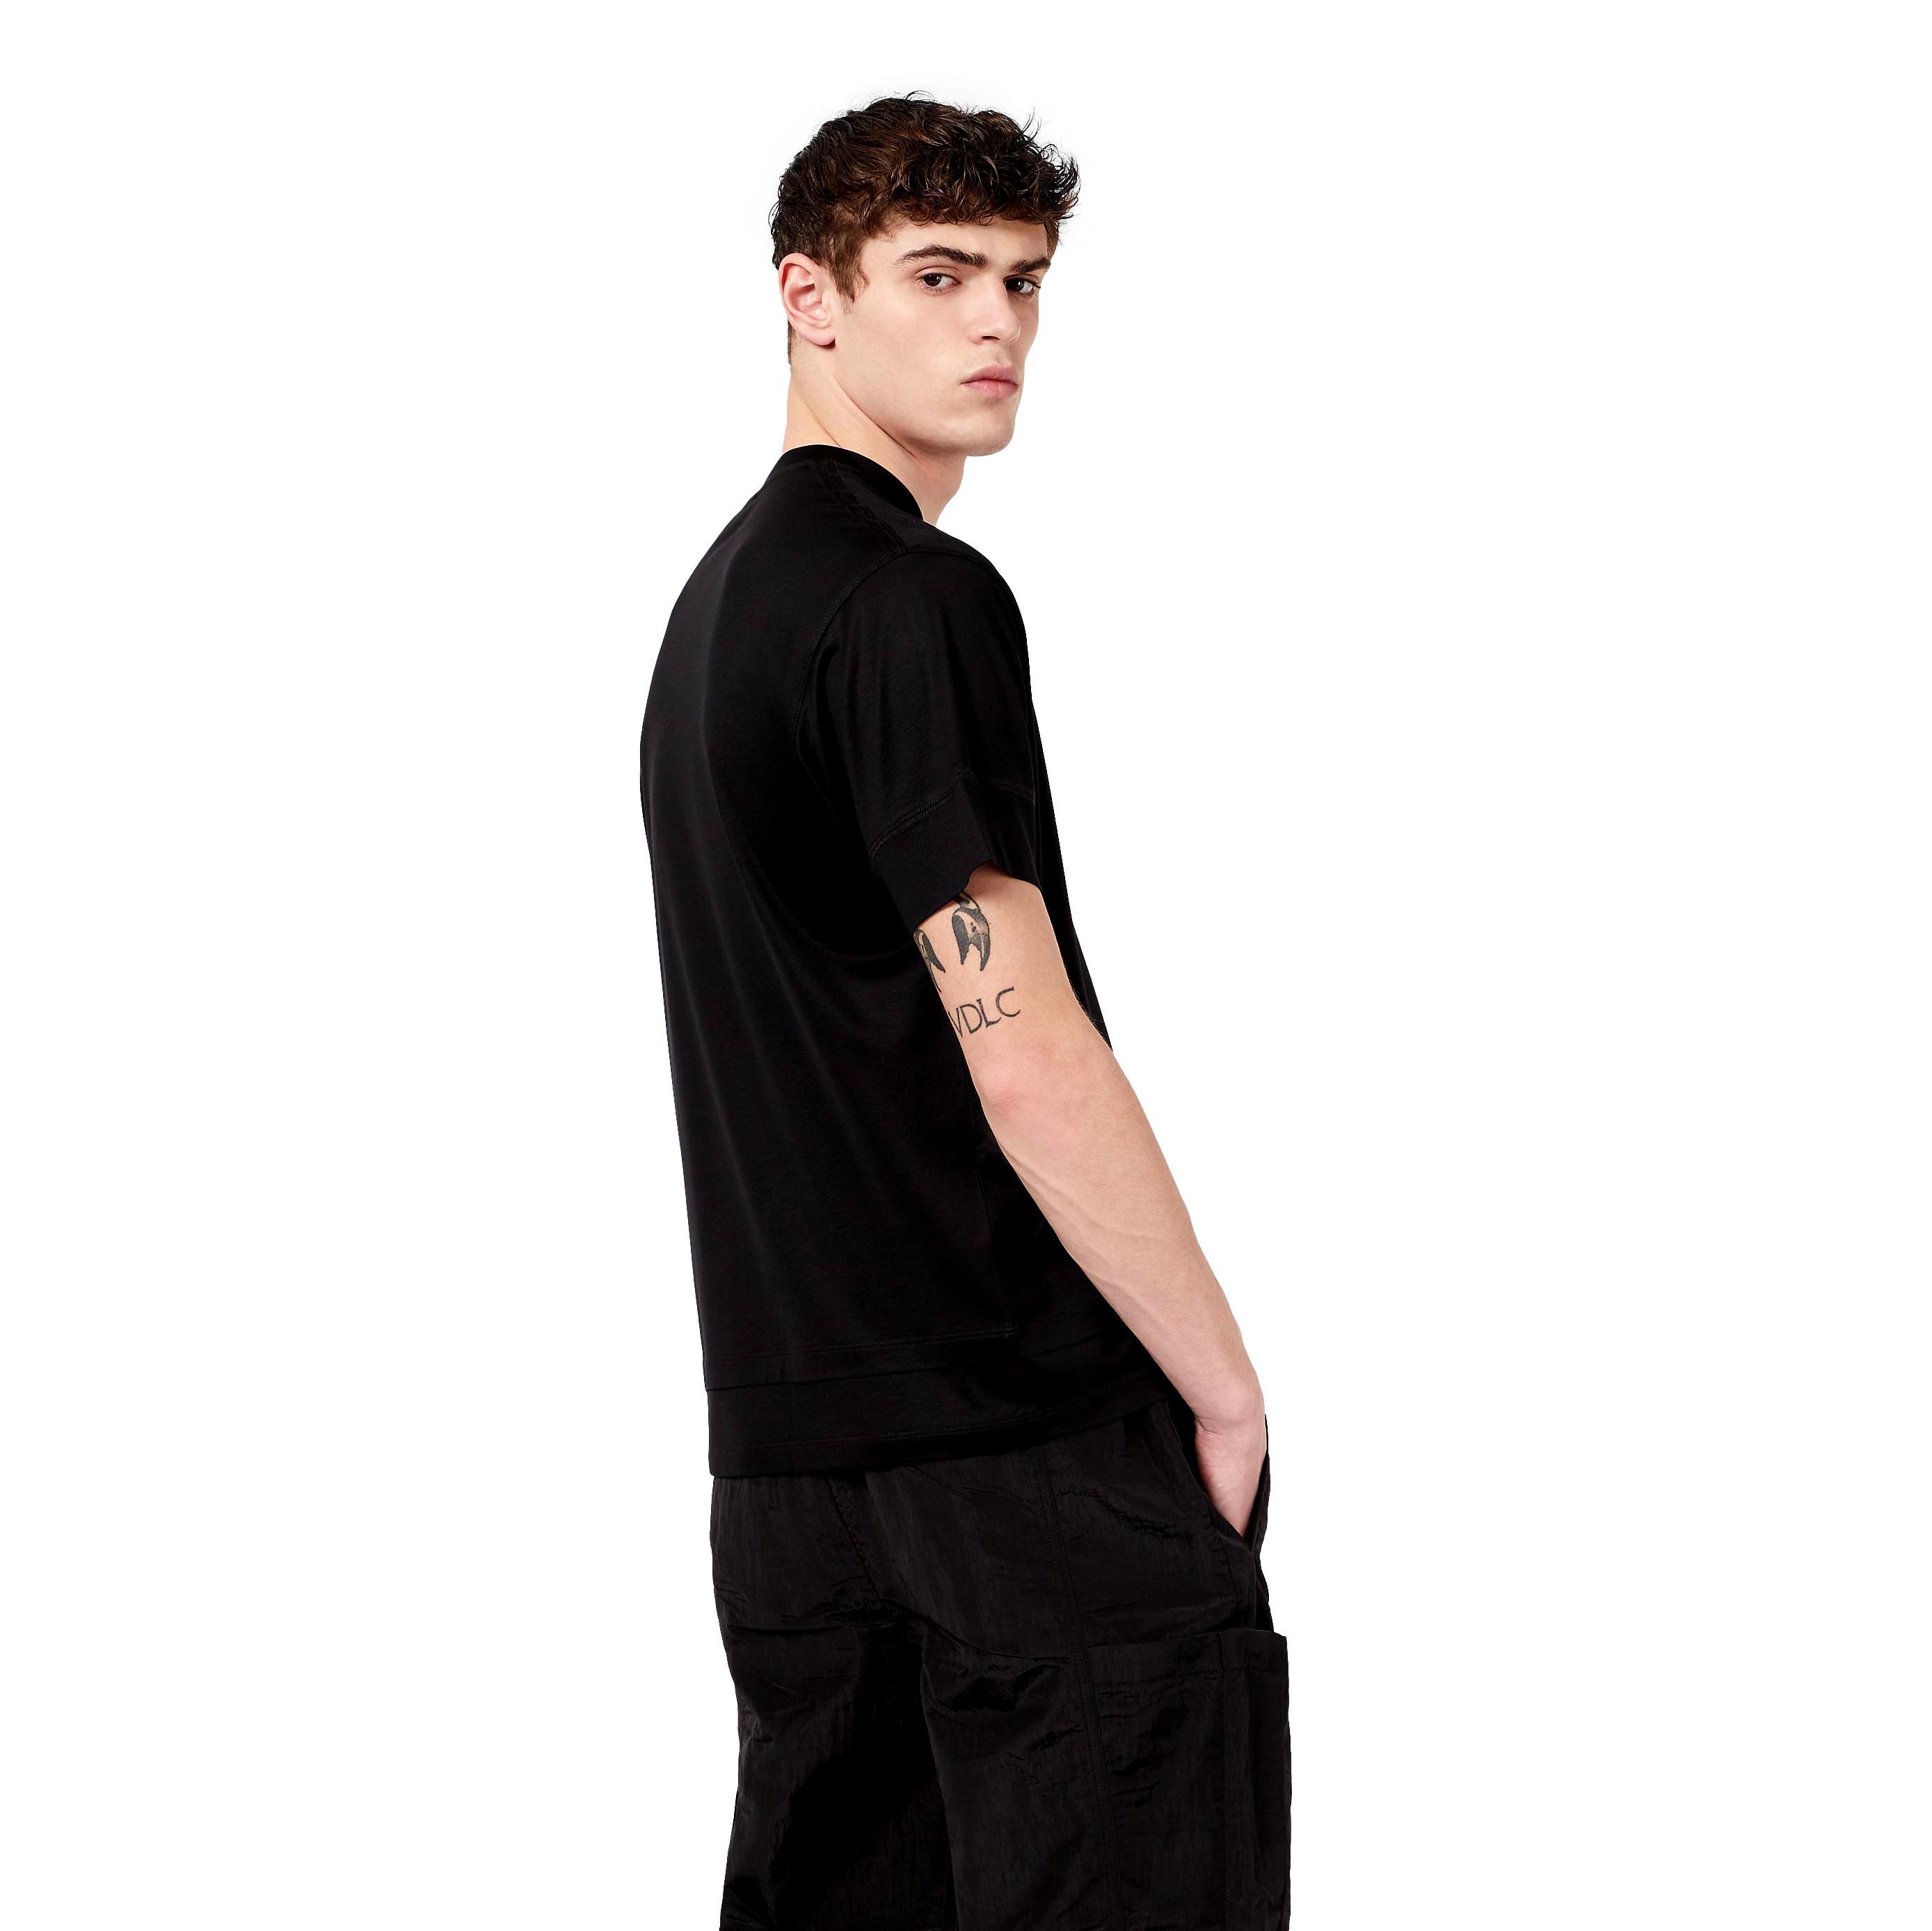 T-Shirt in misto Tencel con tasca applicata EMPORIO ARMANI | T-shirt | 3K1TM2 1JUVZ0999